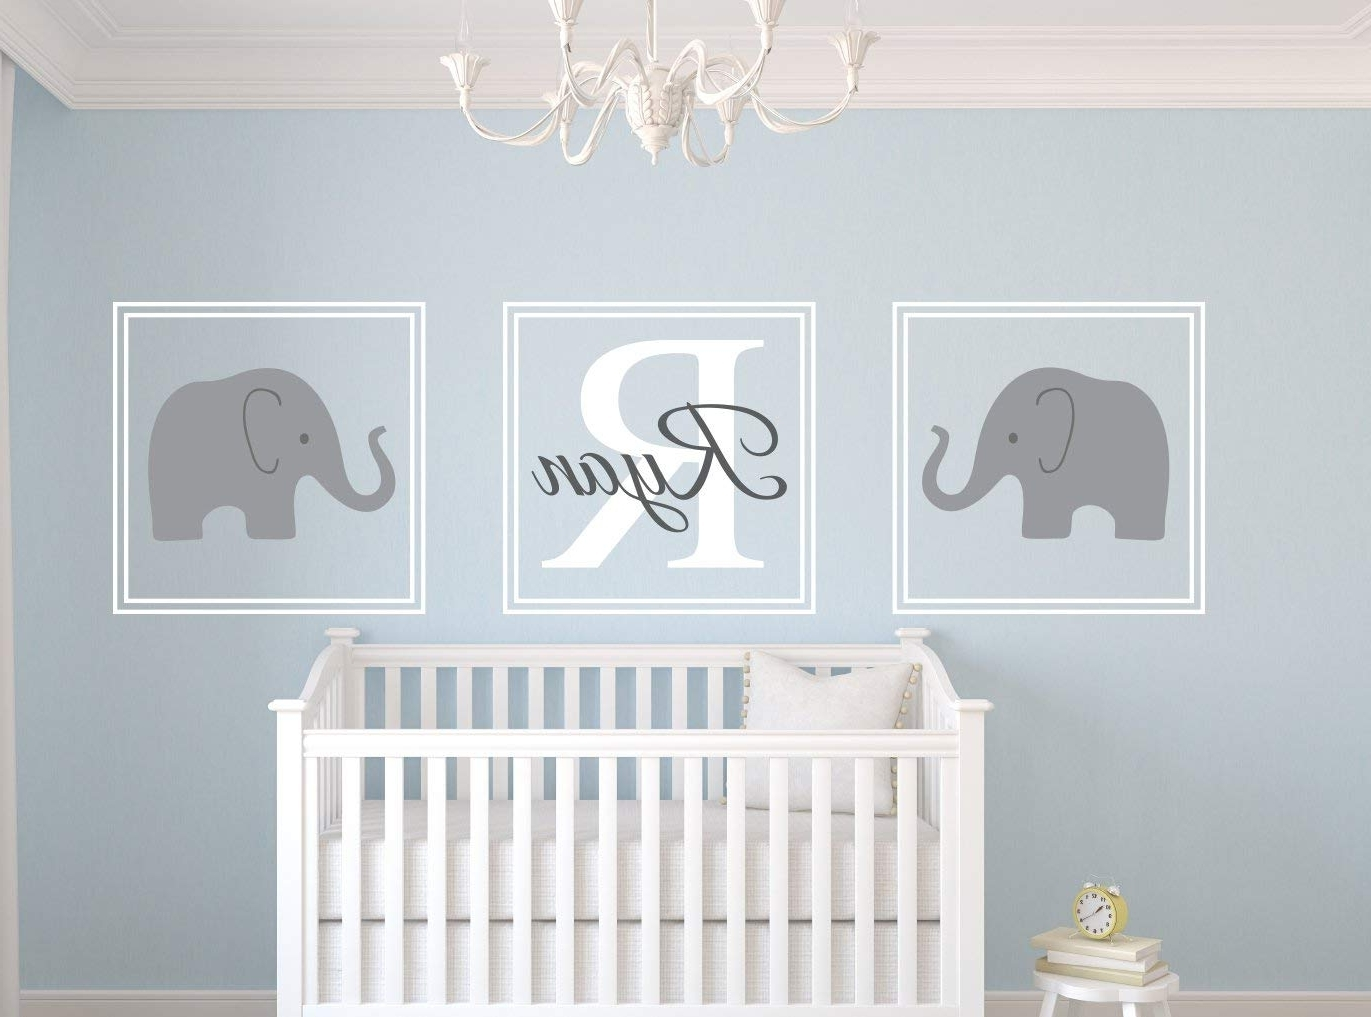 Newest Amazon : Elephant Name Wall Decal Set Nursery Wall Decor : Baby With Nursery Wall Art (View 4 of 15)